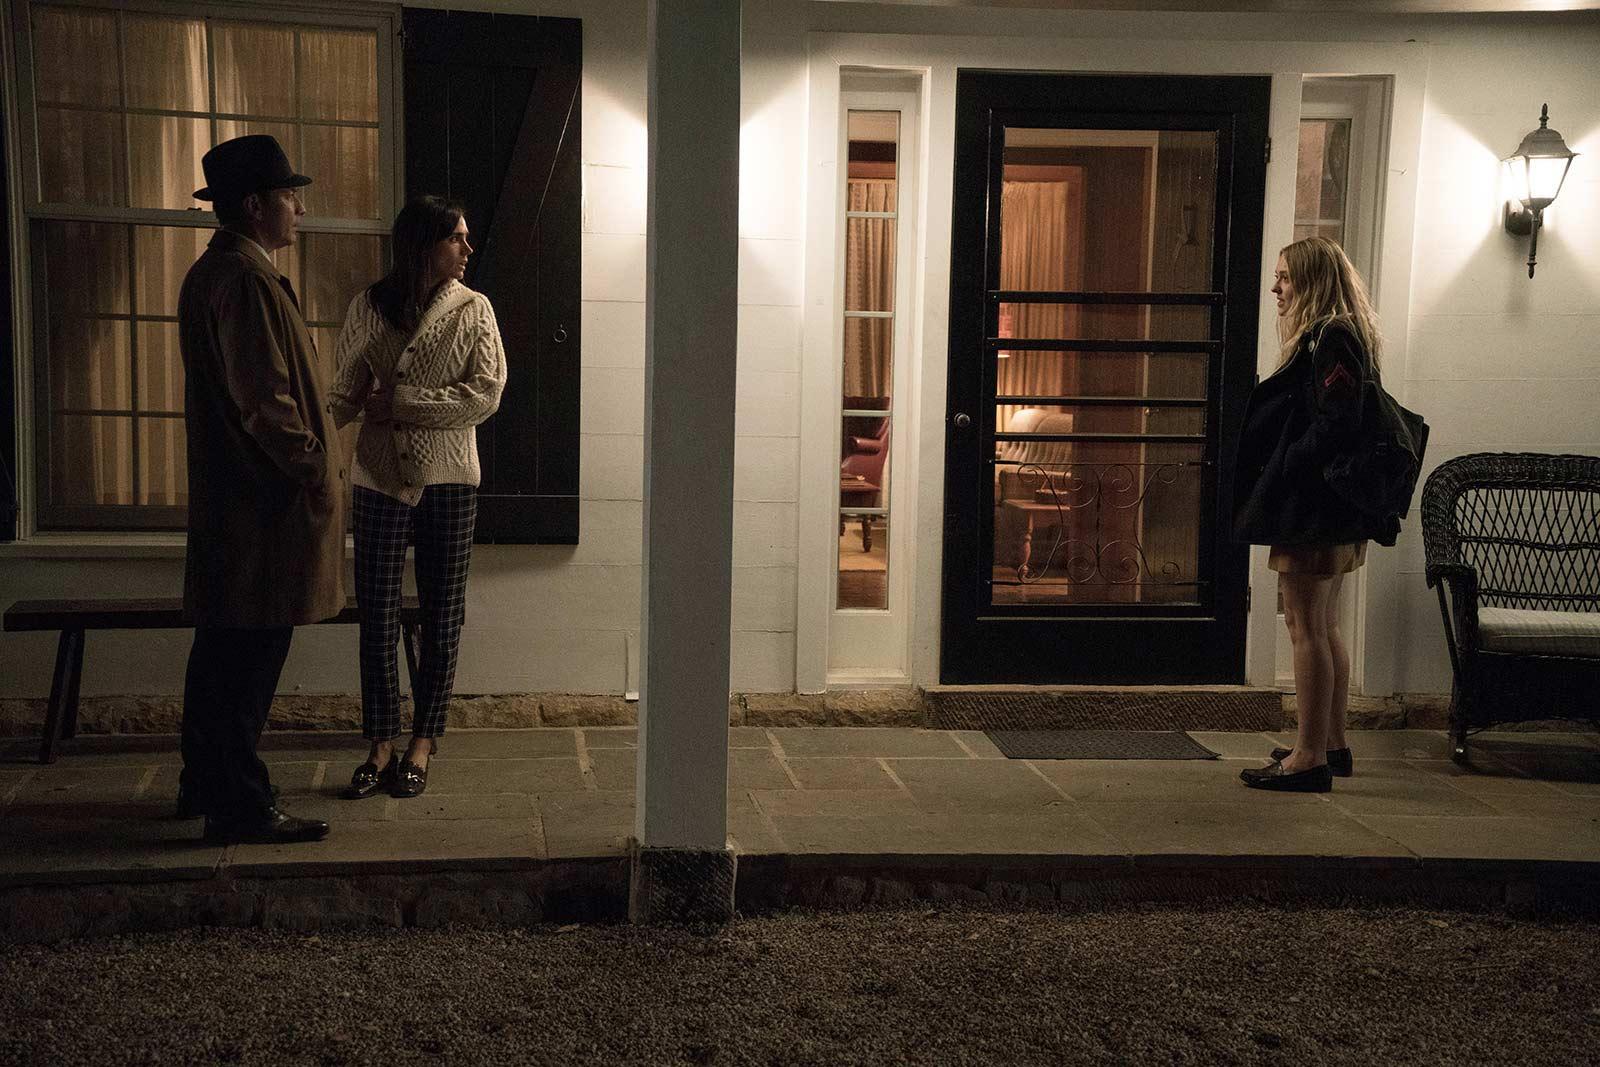 AMERICAN PASTORAL (PASTORAL AMERICANA) - Dakota Fanning; Ewan McGregor; Jennifer Connelly